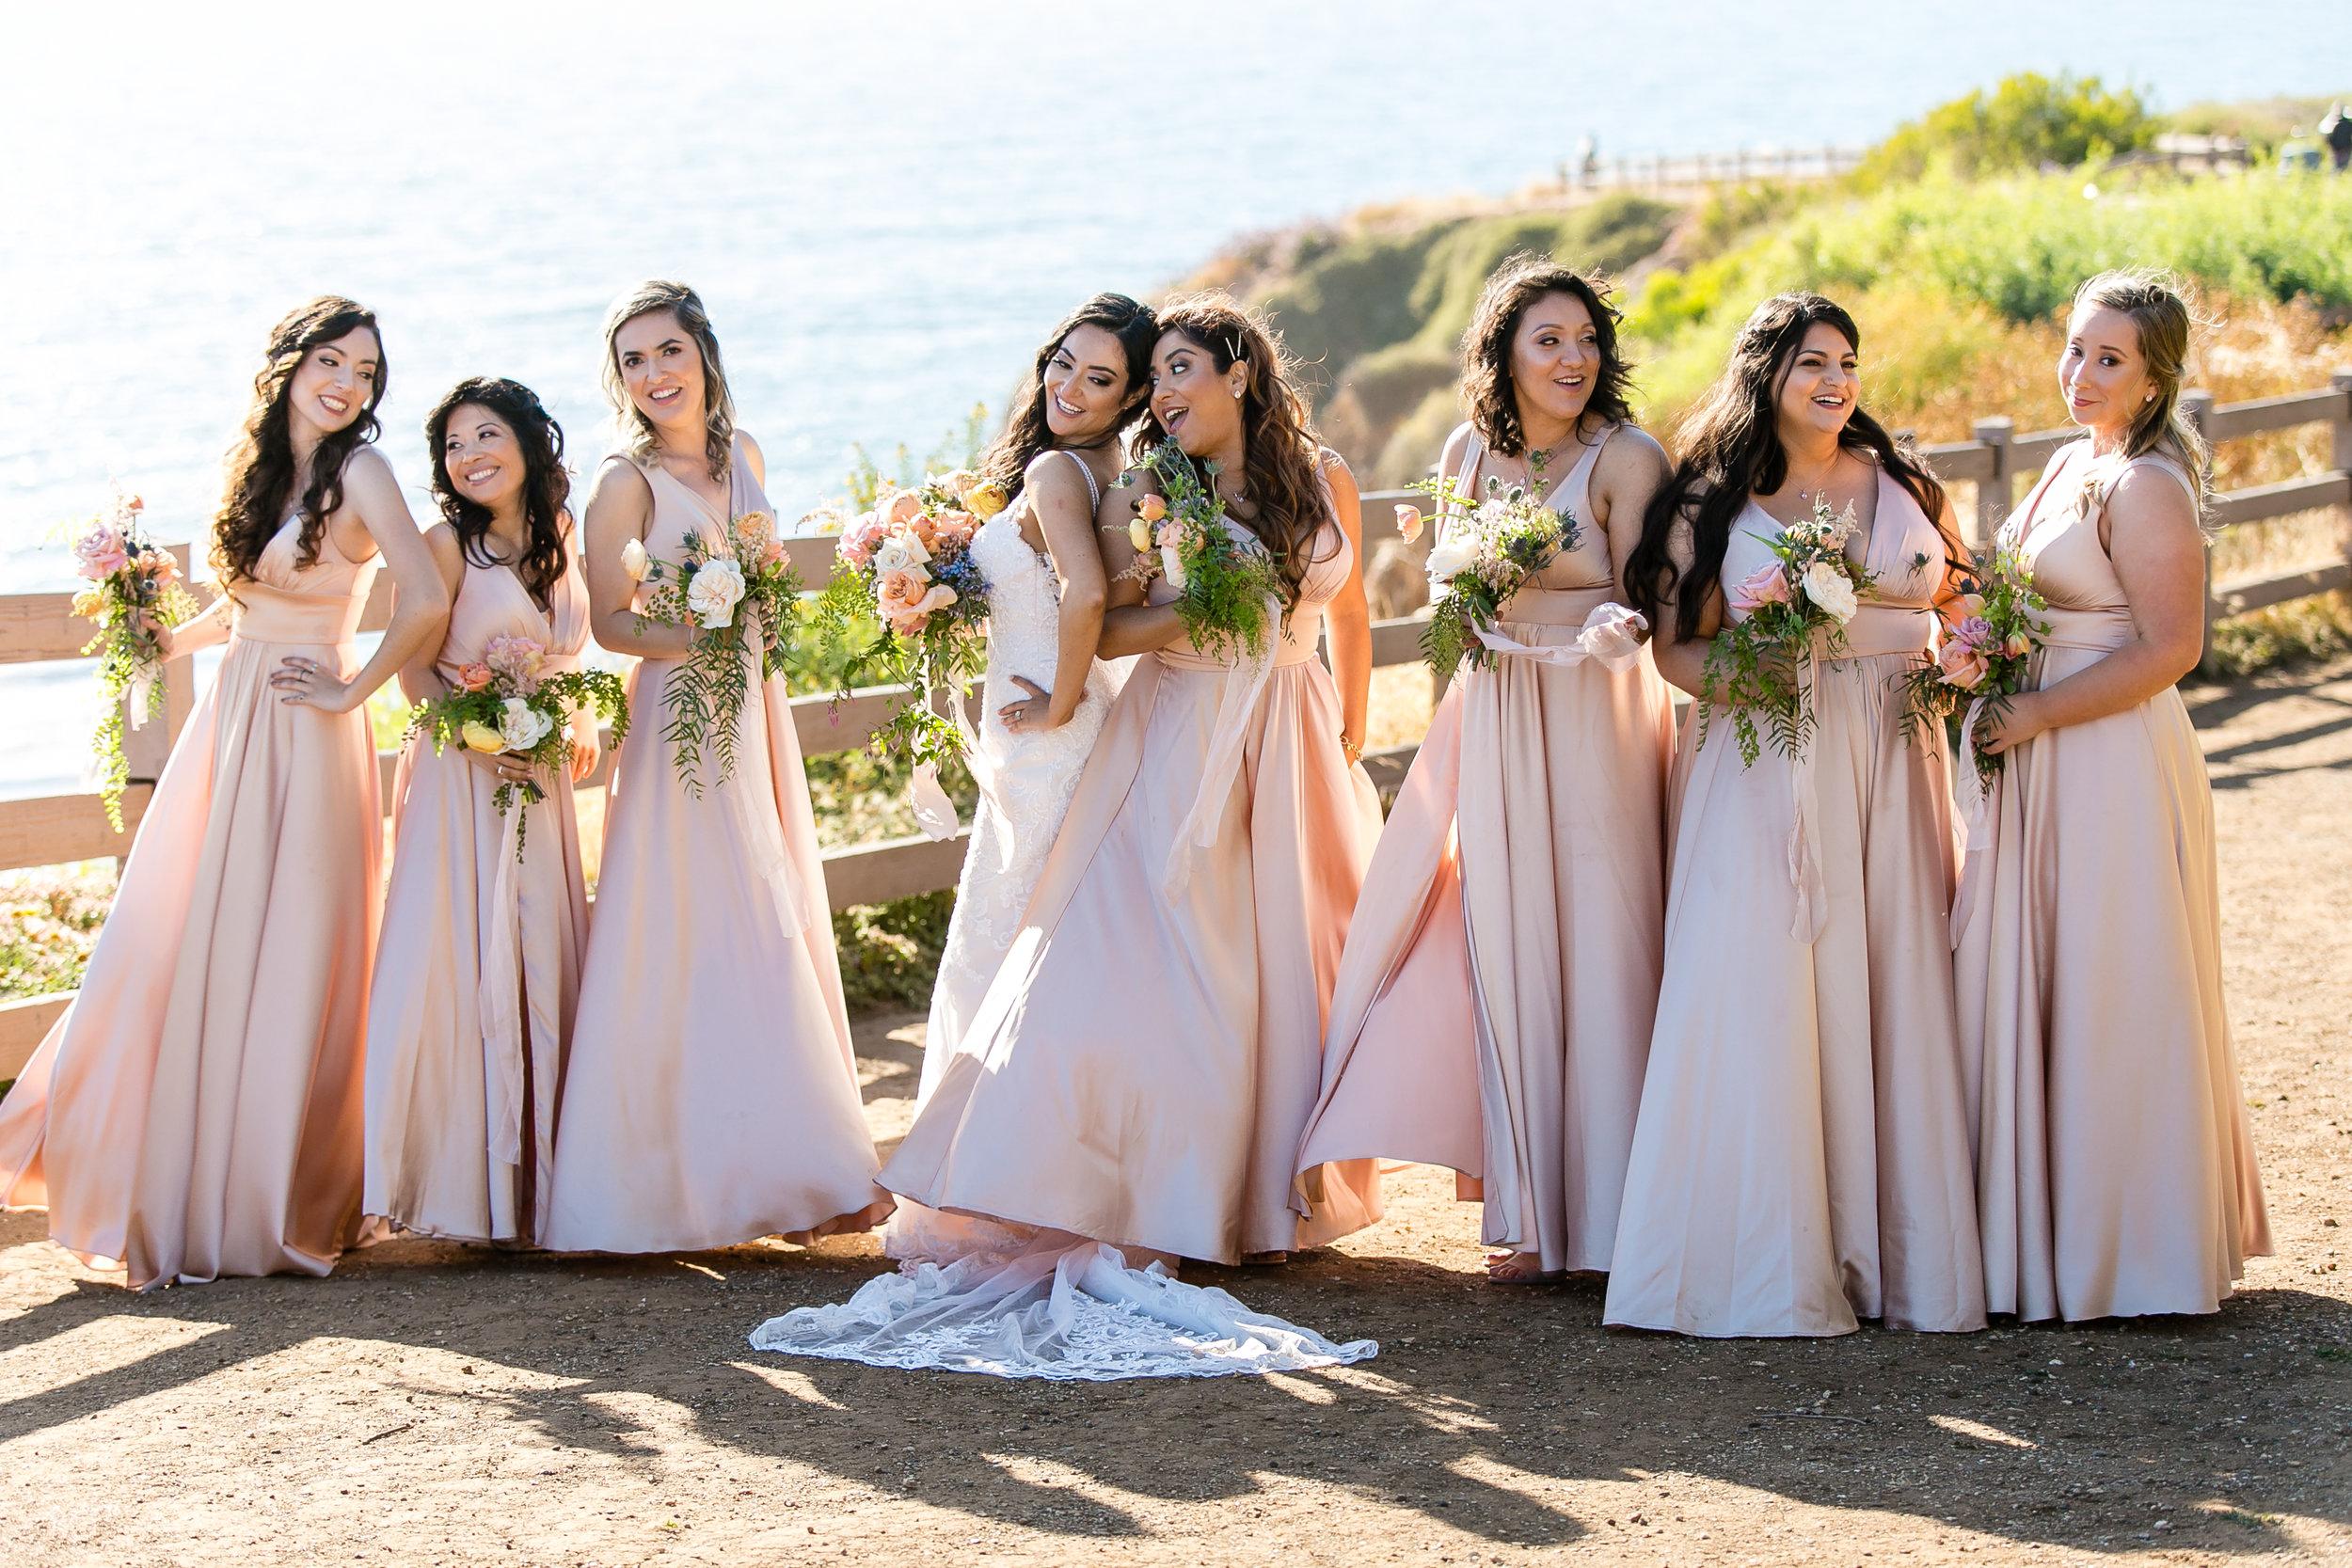 2019_05_24_Wedding_Barajas_0741.jpg